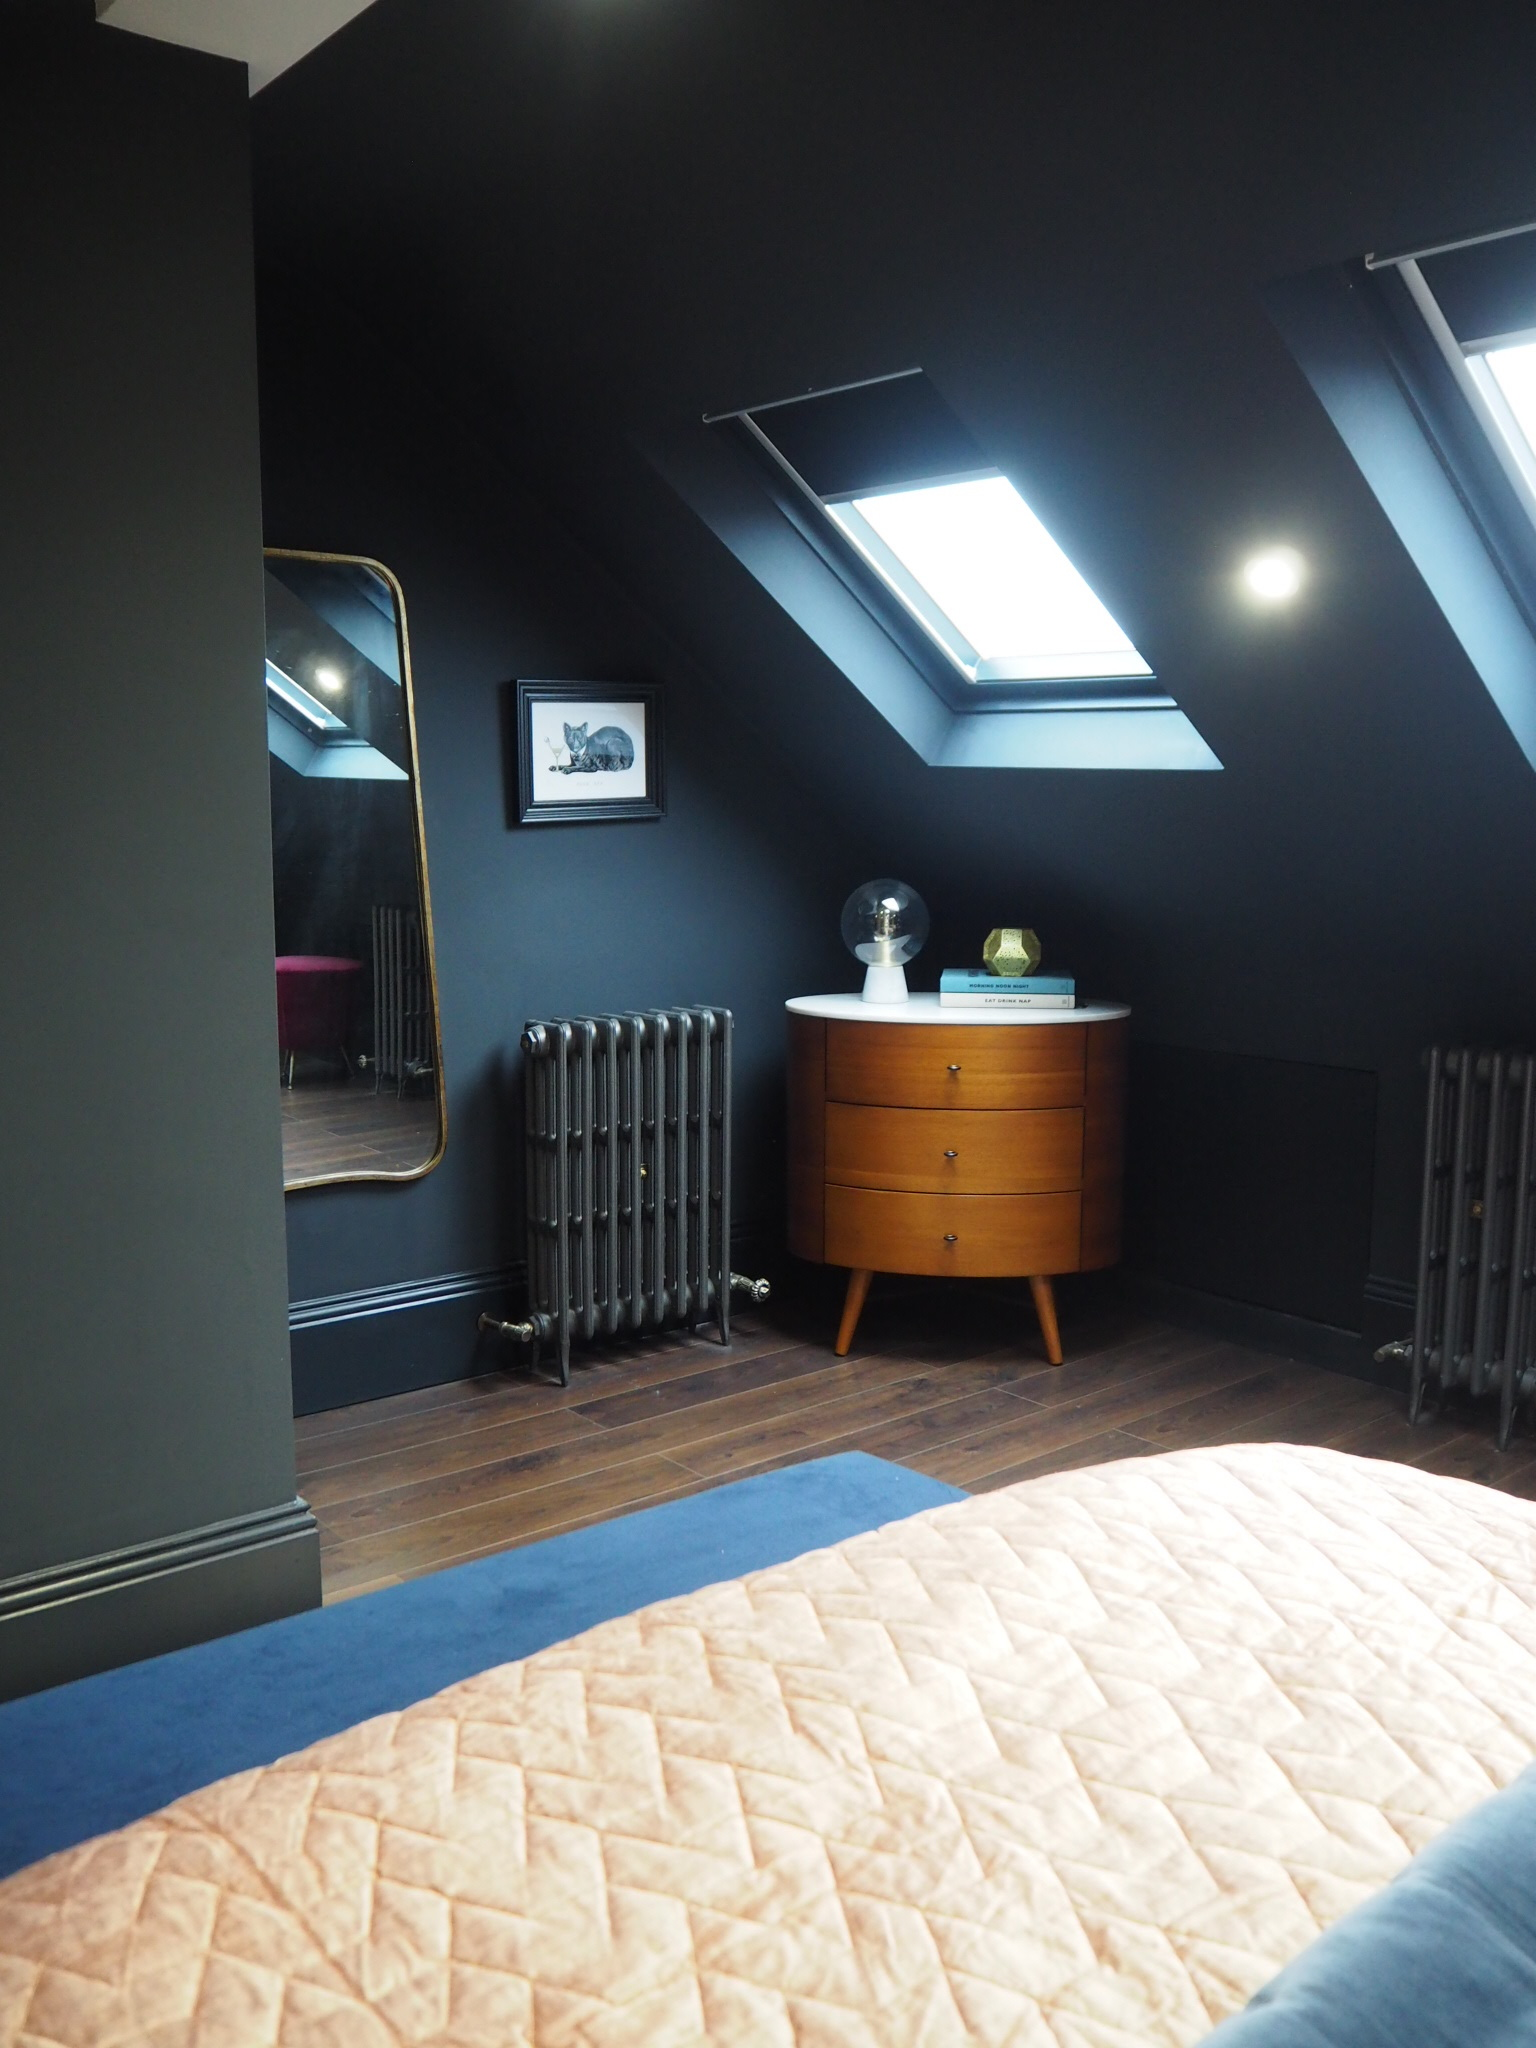 Penelope 3 drawer Dresser  , £599 from West Elm.   Nova table lamp   £129, from West Elm